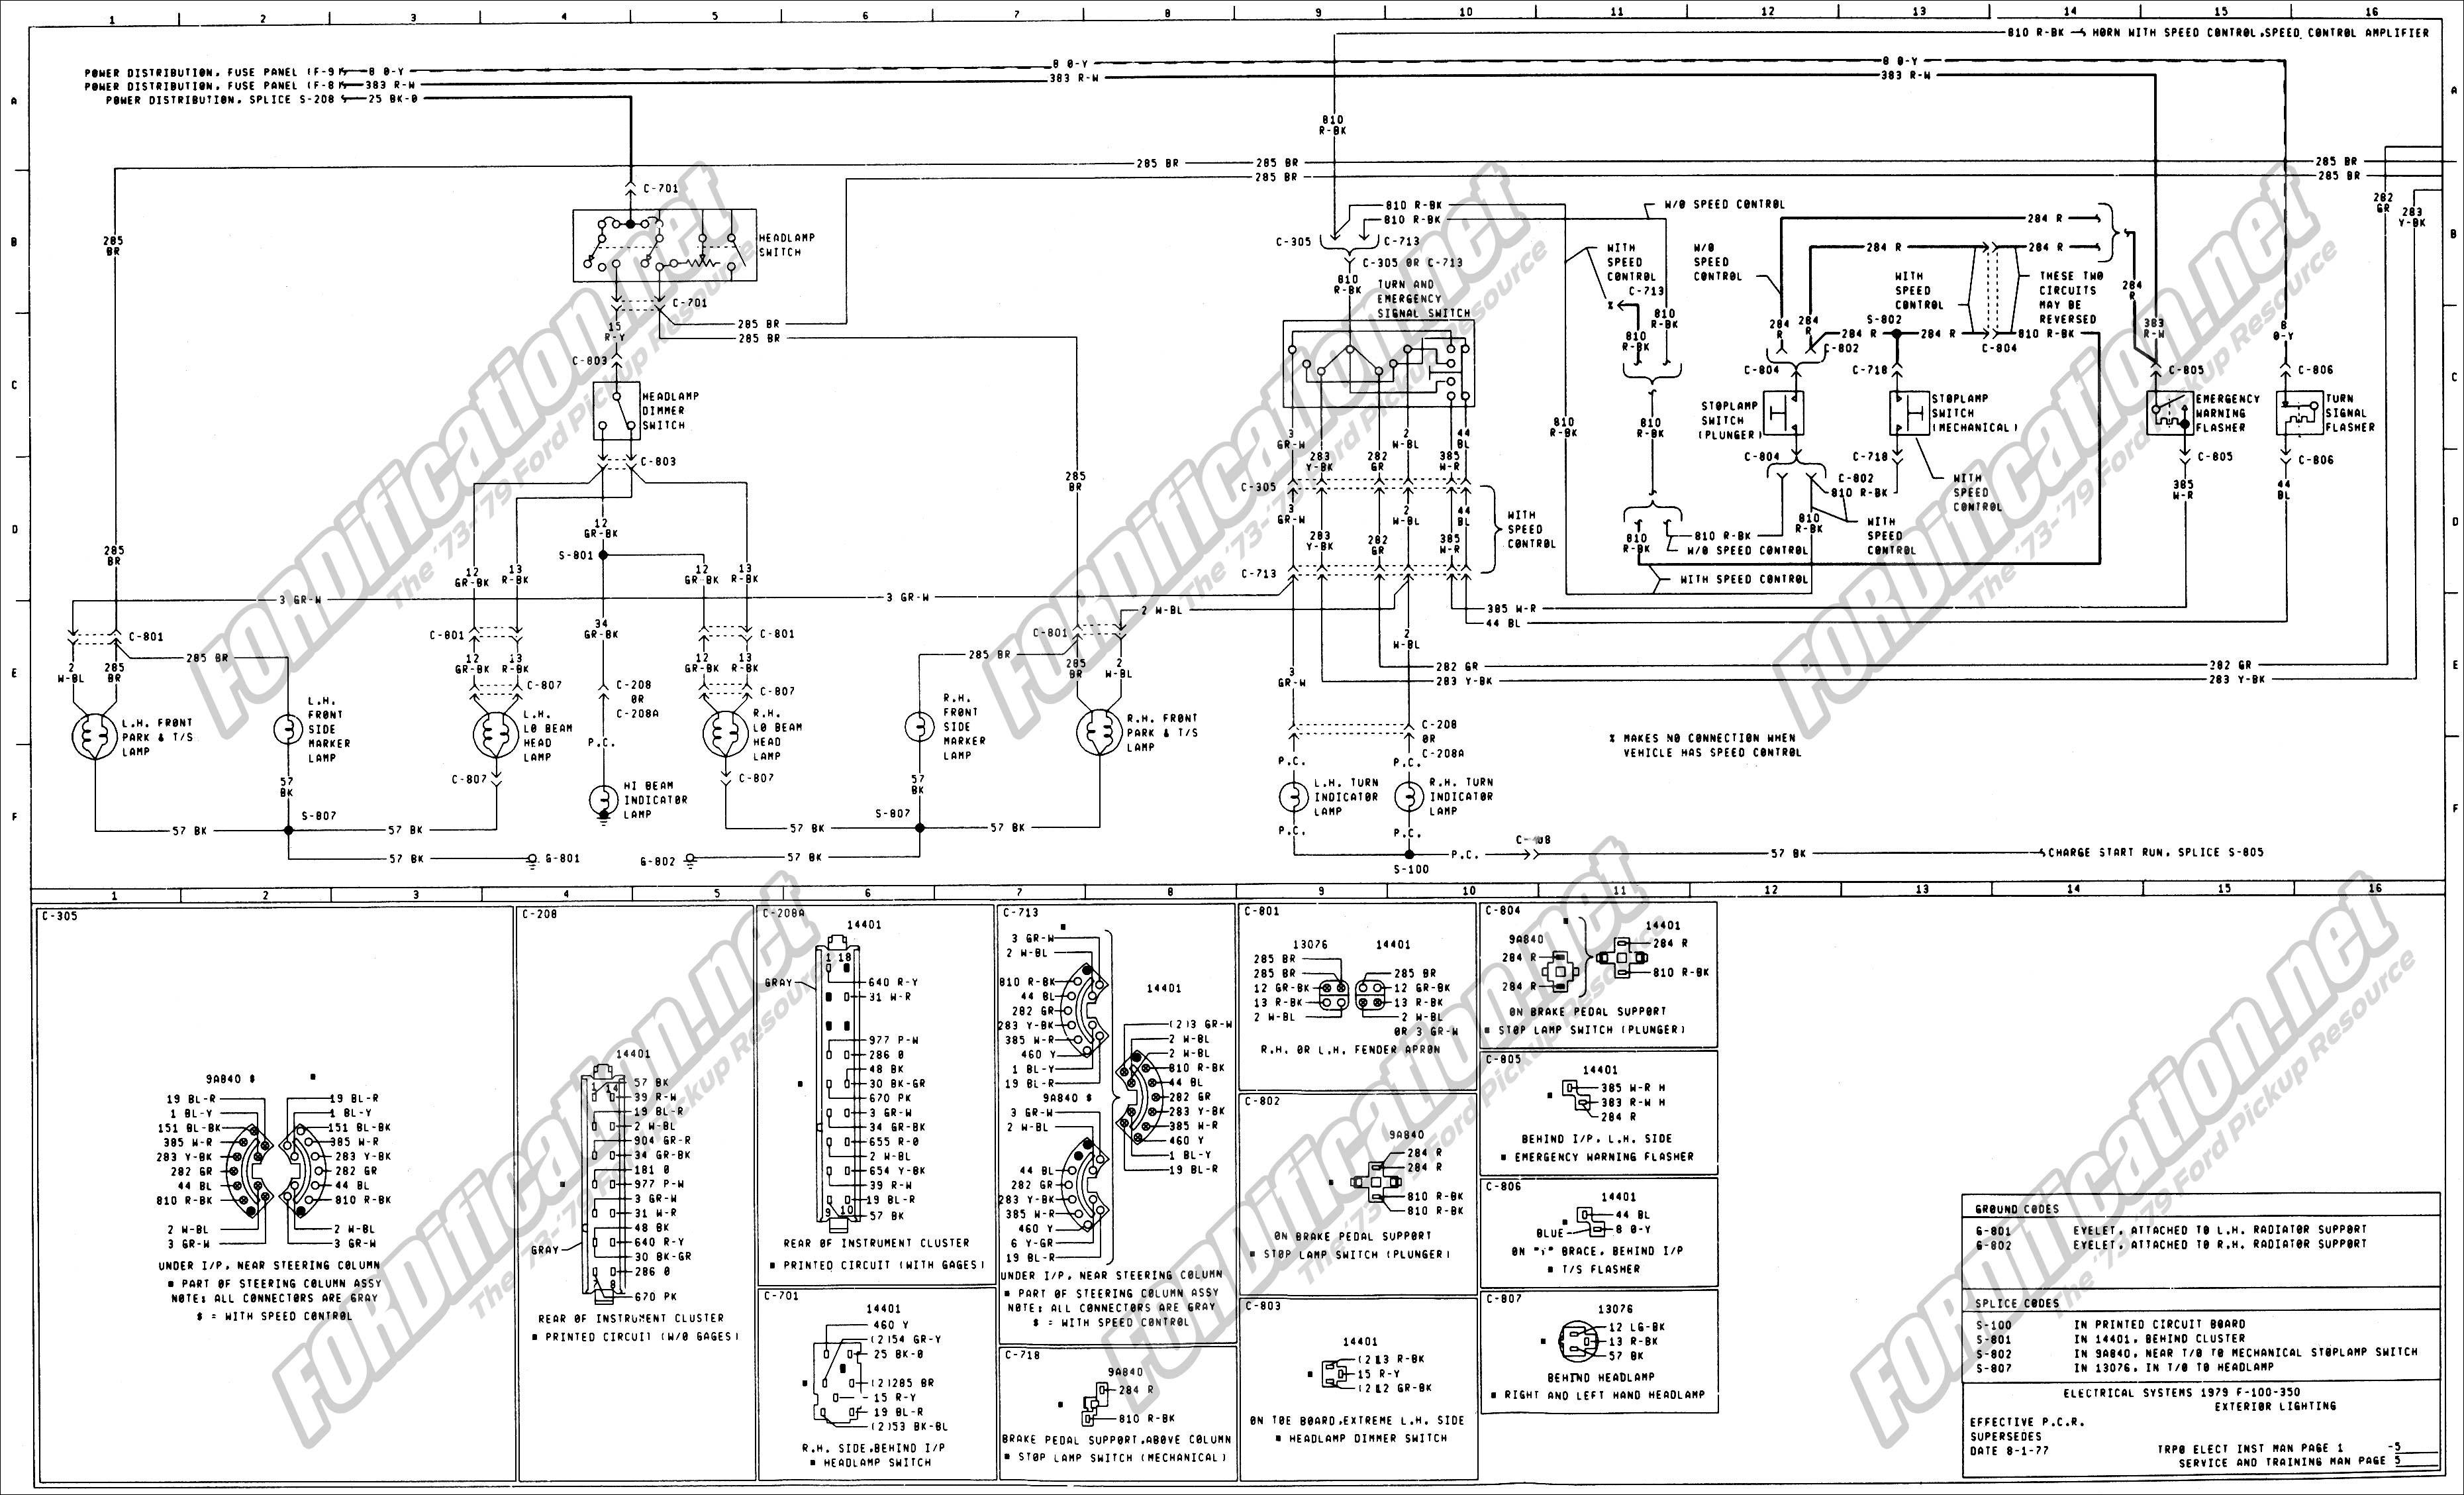 Ford Trailer Plug Wiring Diagram Trailer to ford F350 Wiring Diagram Wiring Diagram Of Ford Trailer Plug Wiring Diagram